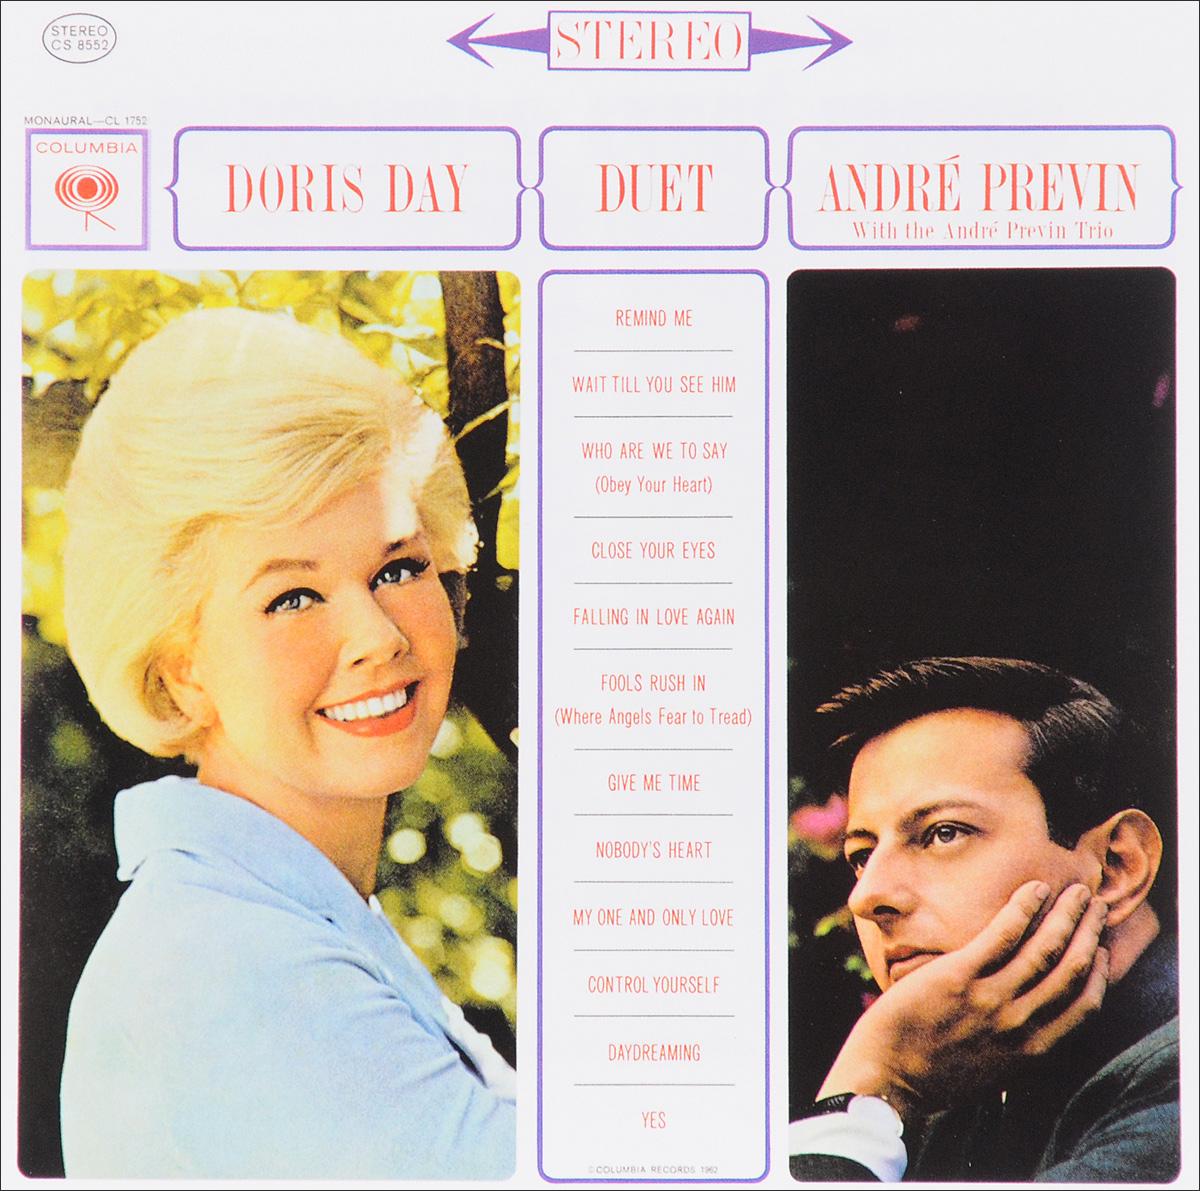 Дорис Дэй,Андрэ Превен Doris Day & Andre Previn. Duet andre previn page 7